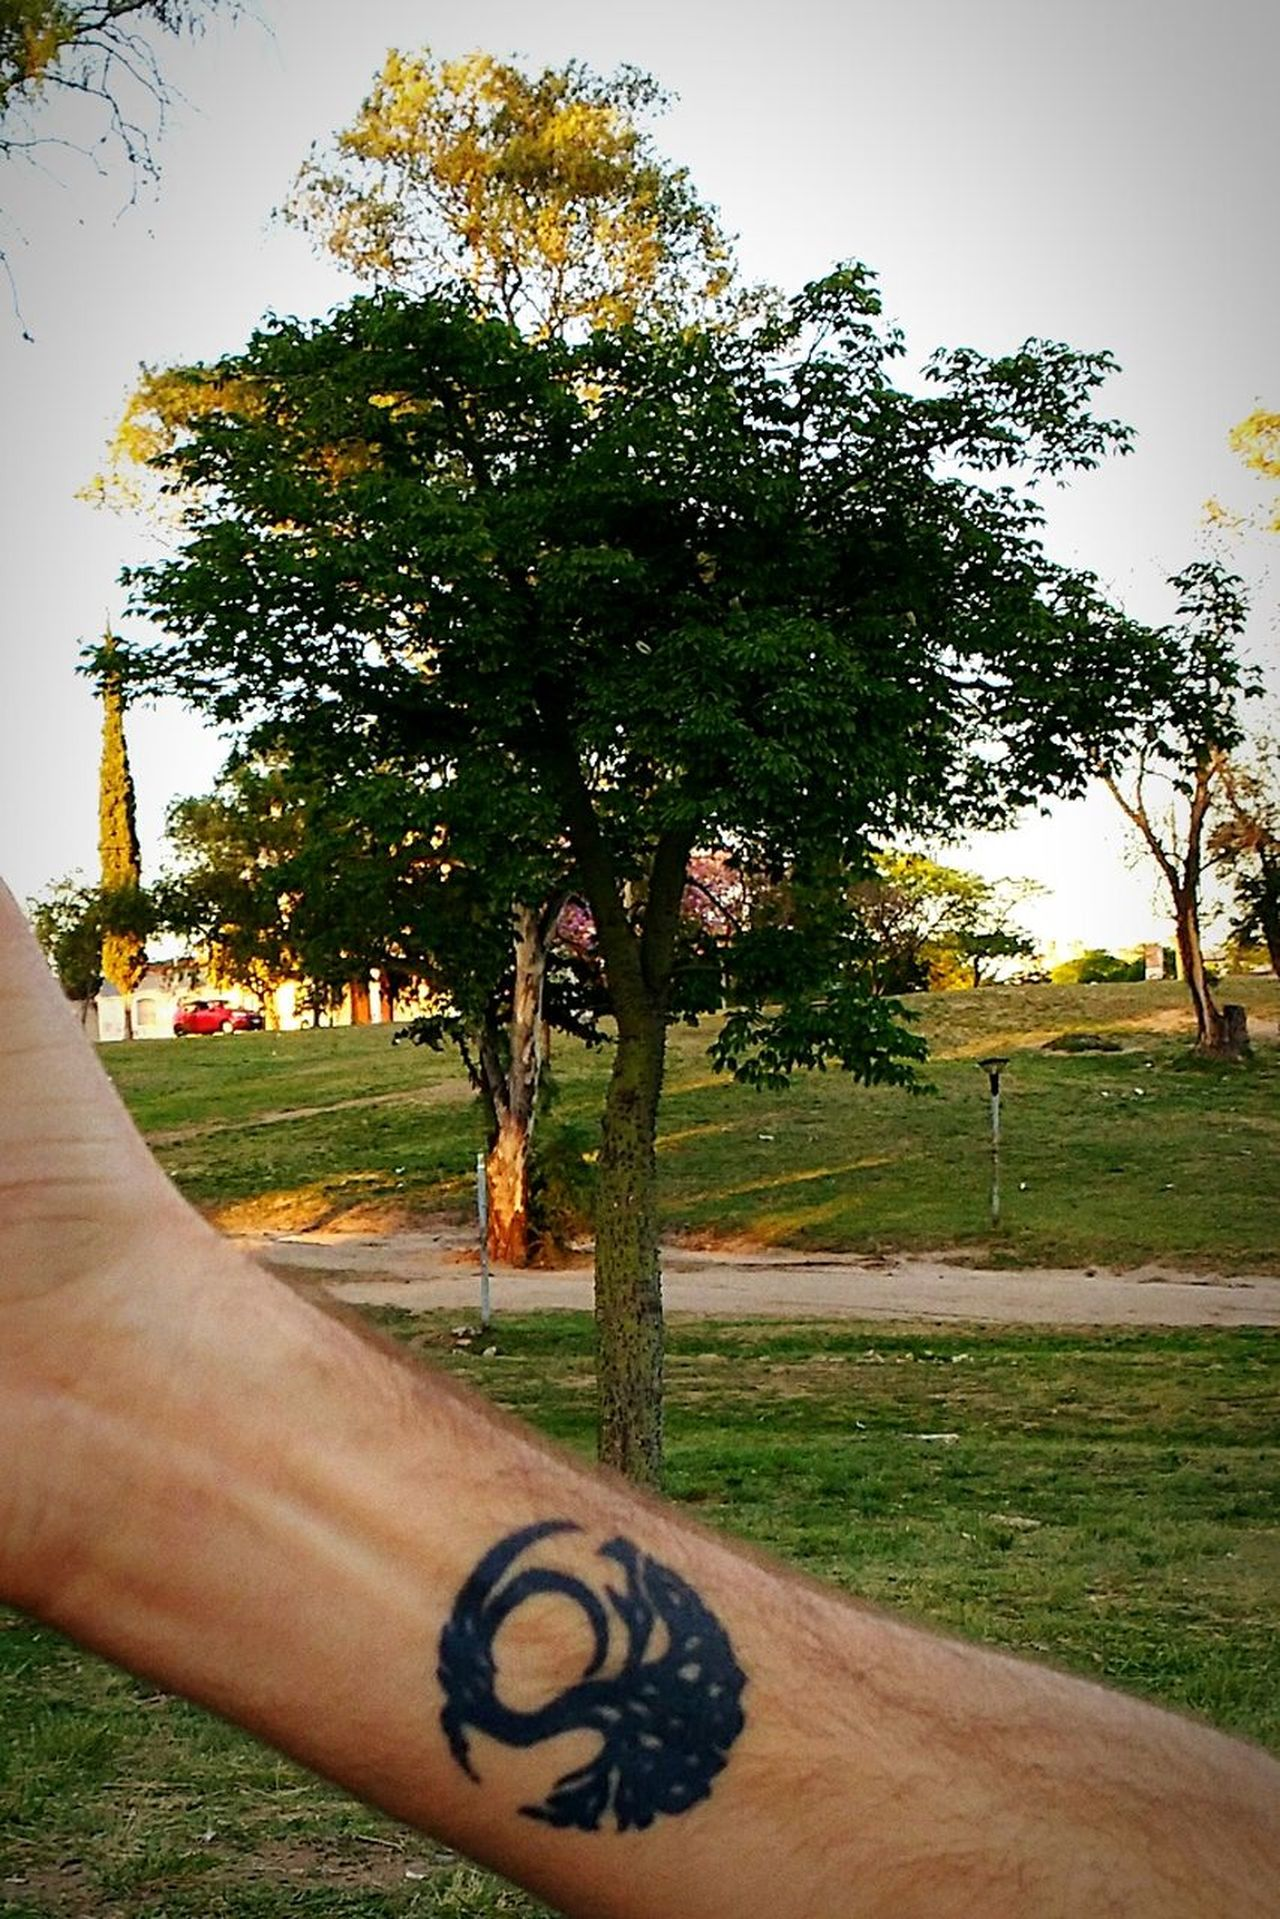 Tattoo Tree Lifetree Tatuaje árbol Arbol De La Vida ArbreDeVie Amanecer